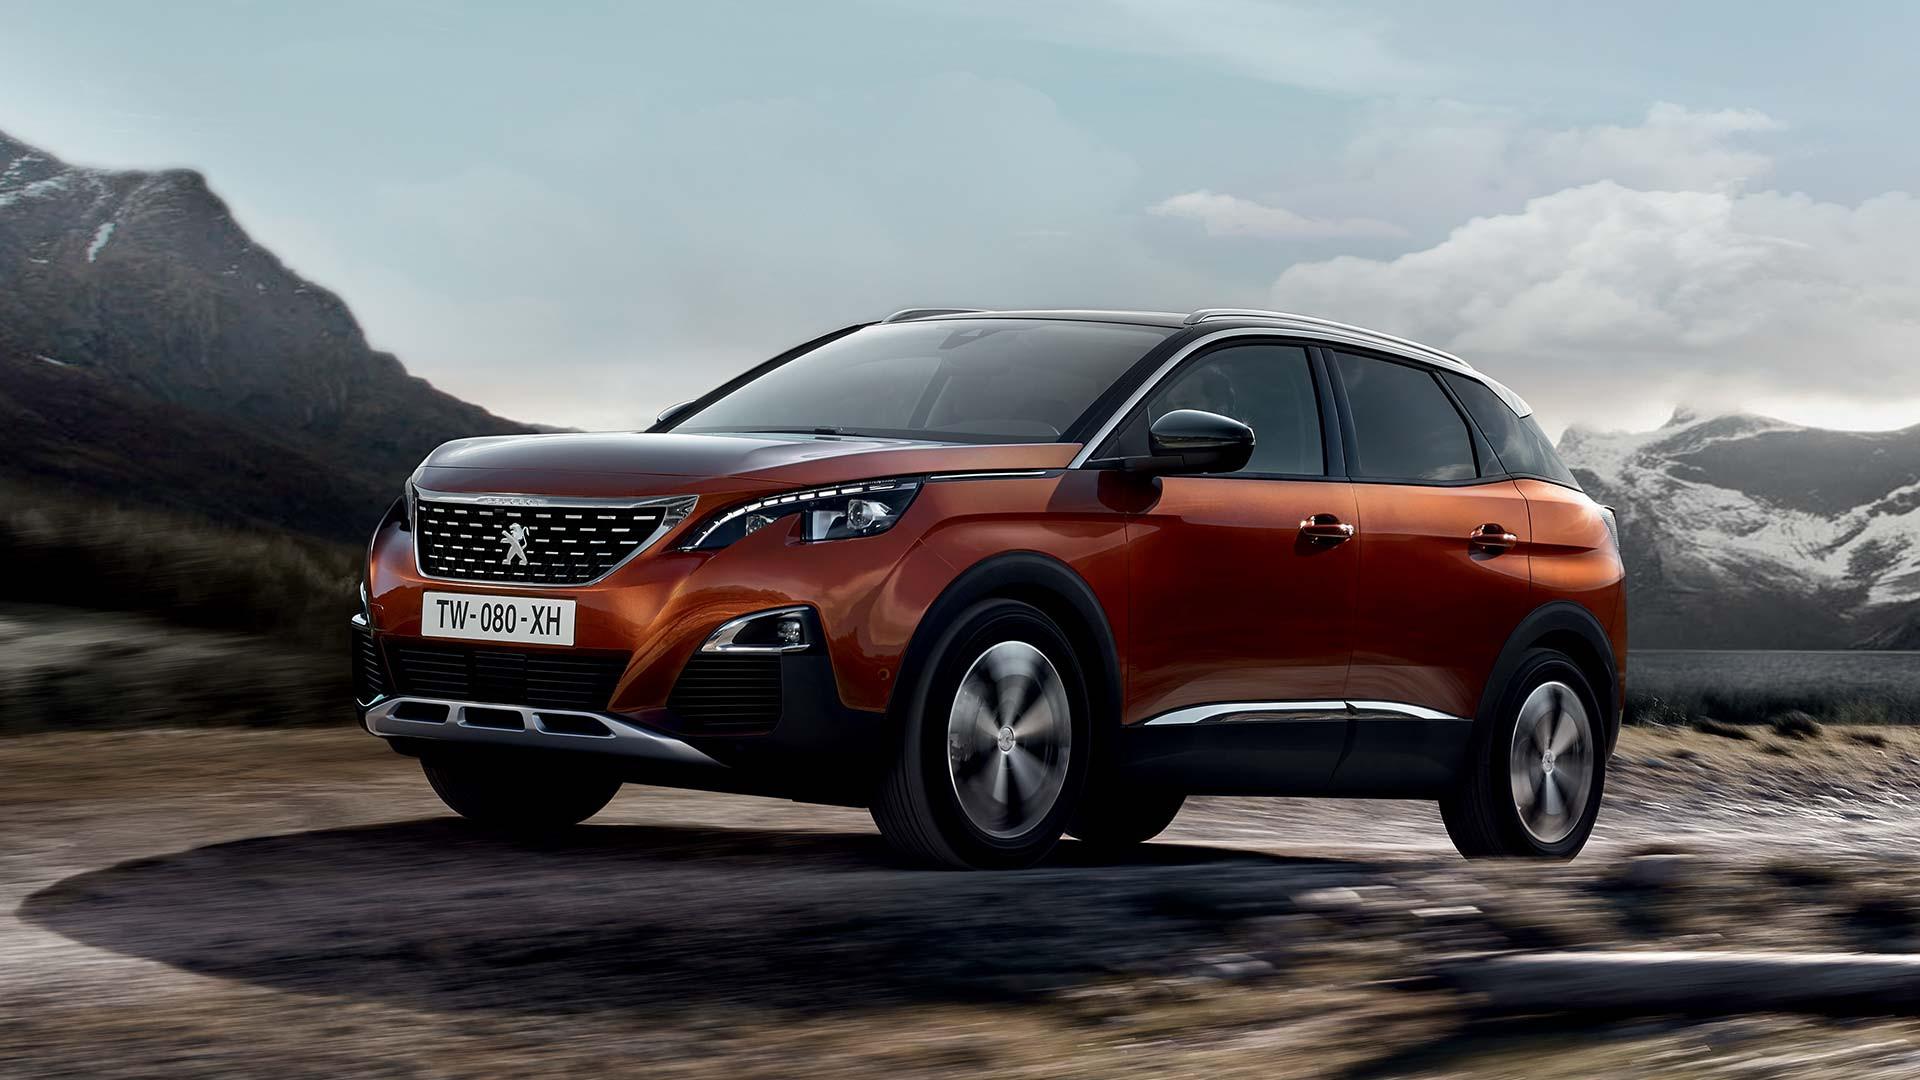 Prodaja automobila u Evropi porasla za 6 odsto